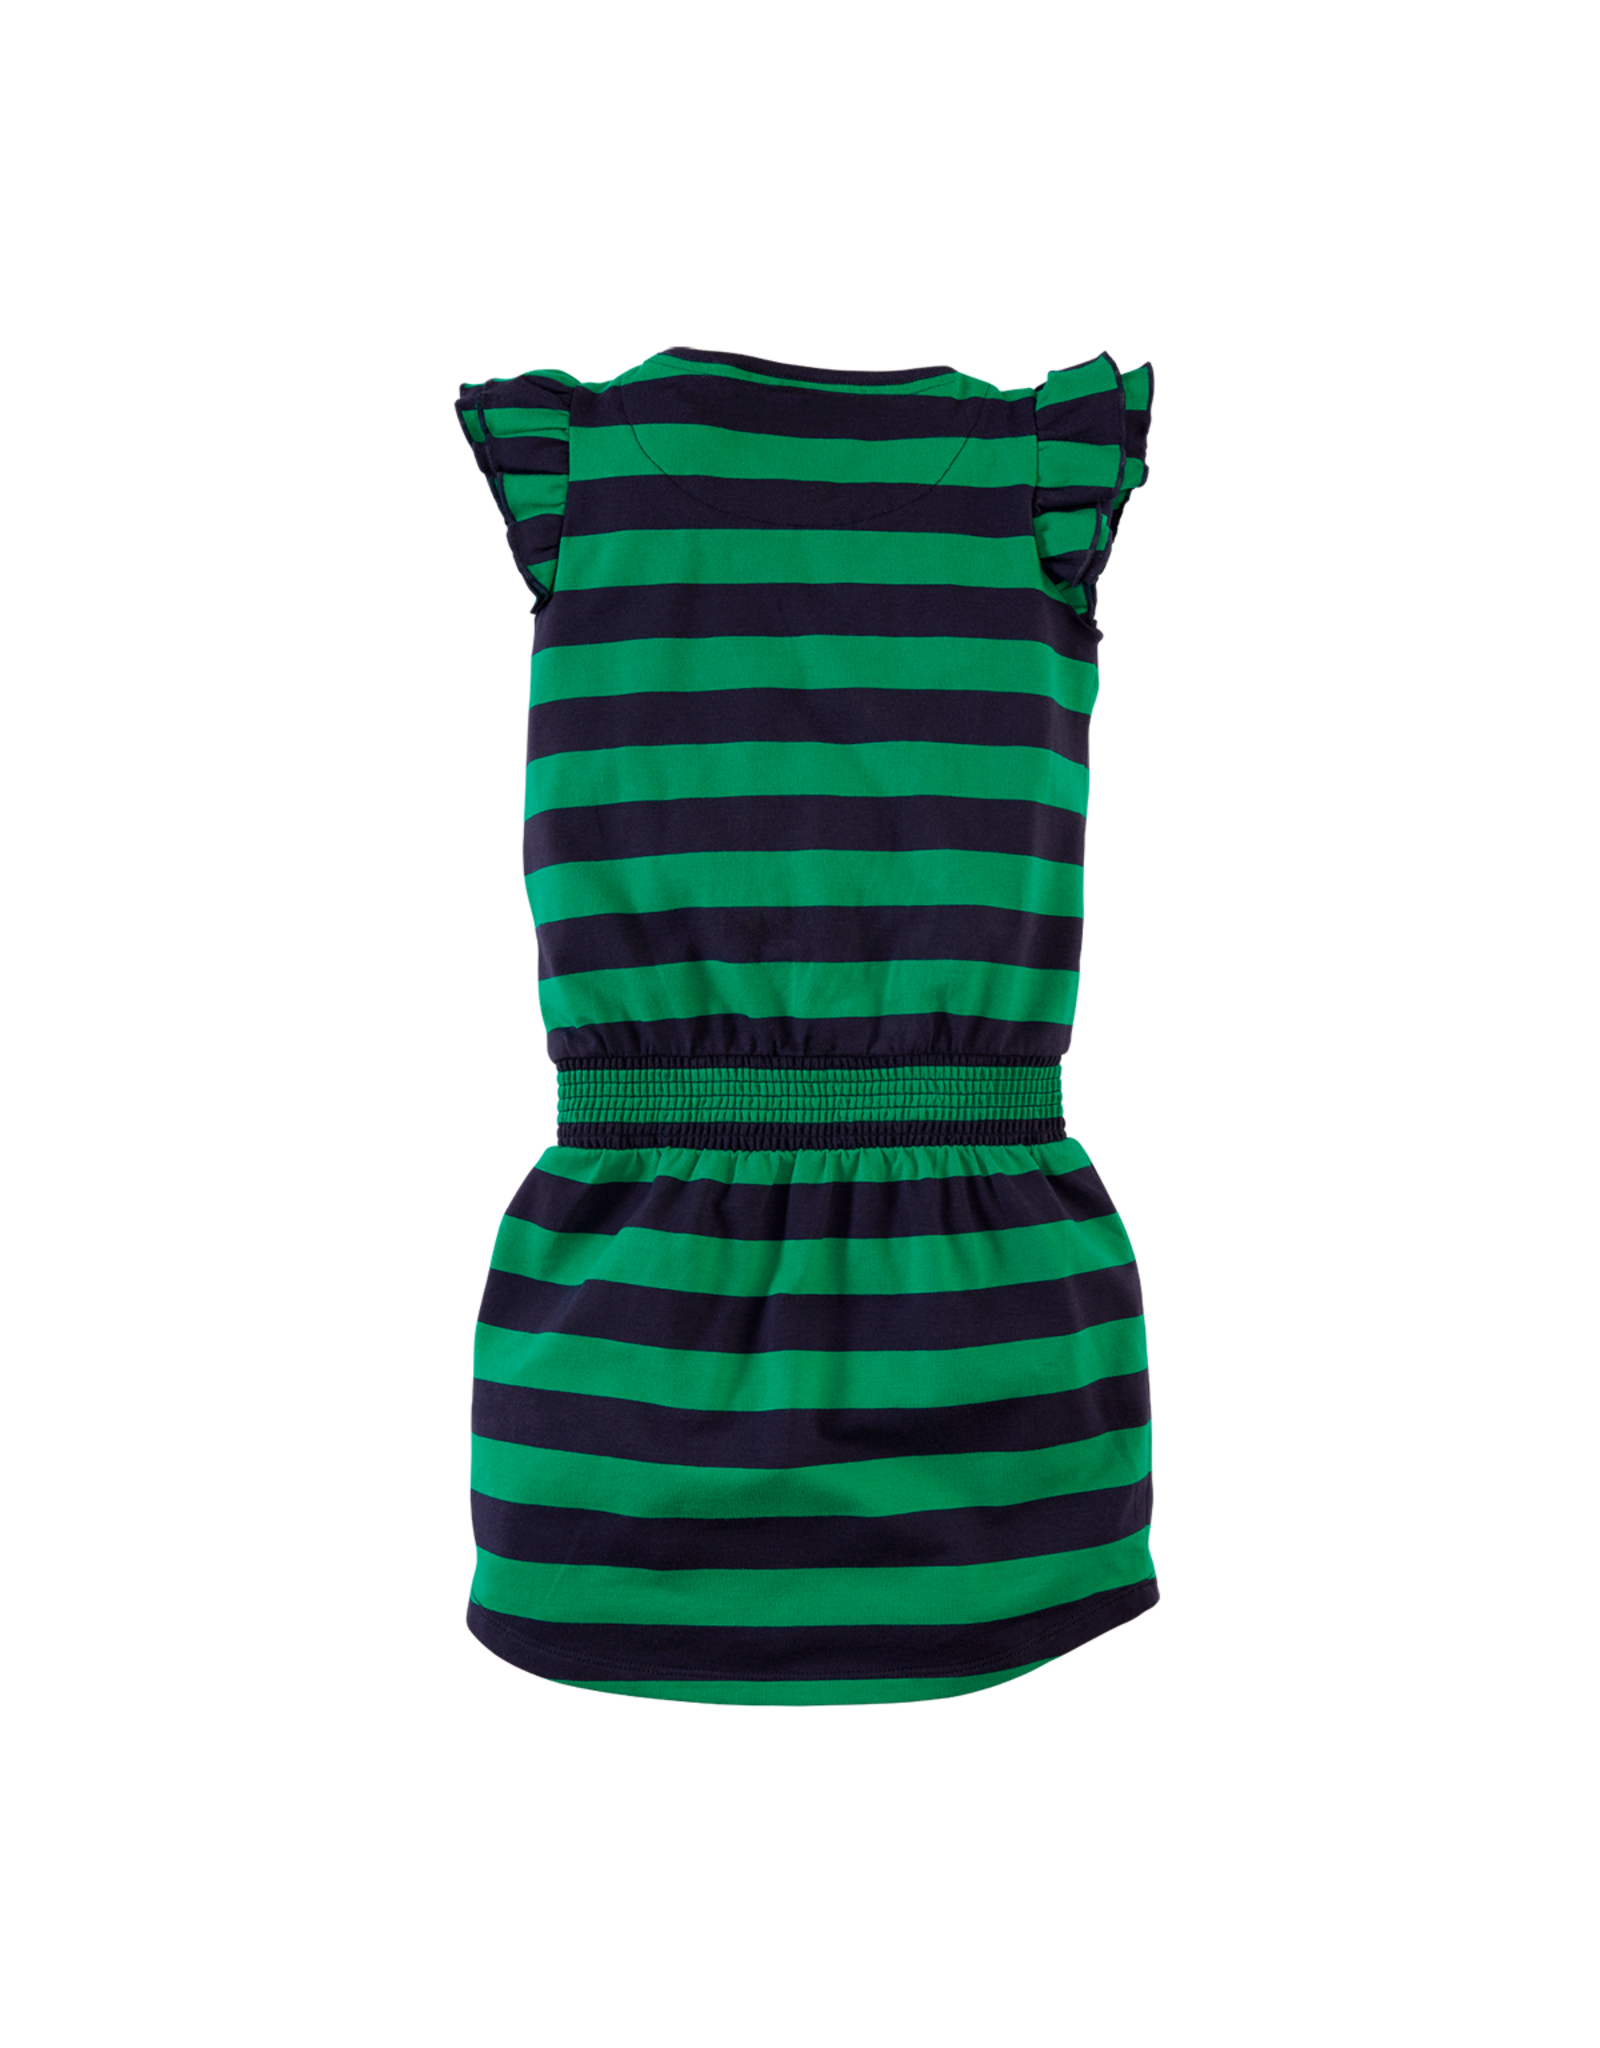 Z8 Michelle Groovy green/Noisy navy